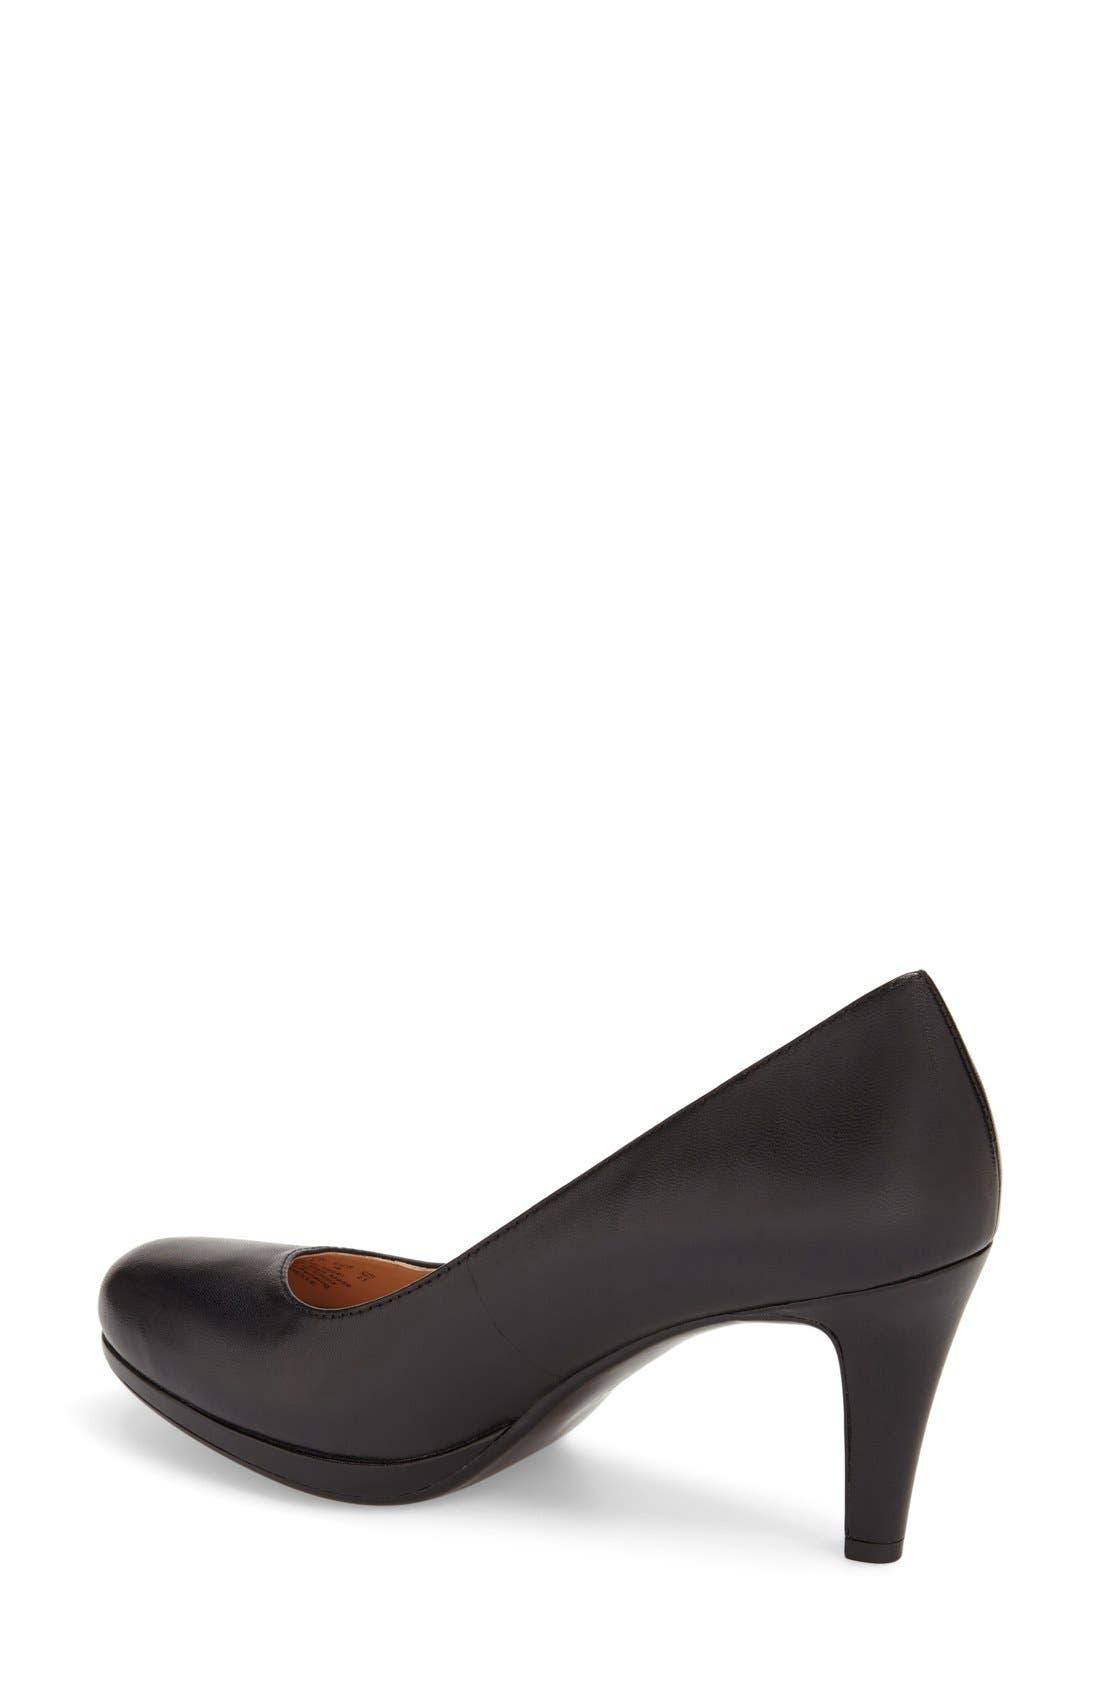 'Michelle' Almond Toe Pump,                             Alternate thumbnail 4, color,                             BLACK LEATHER